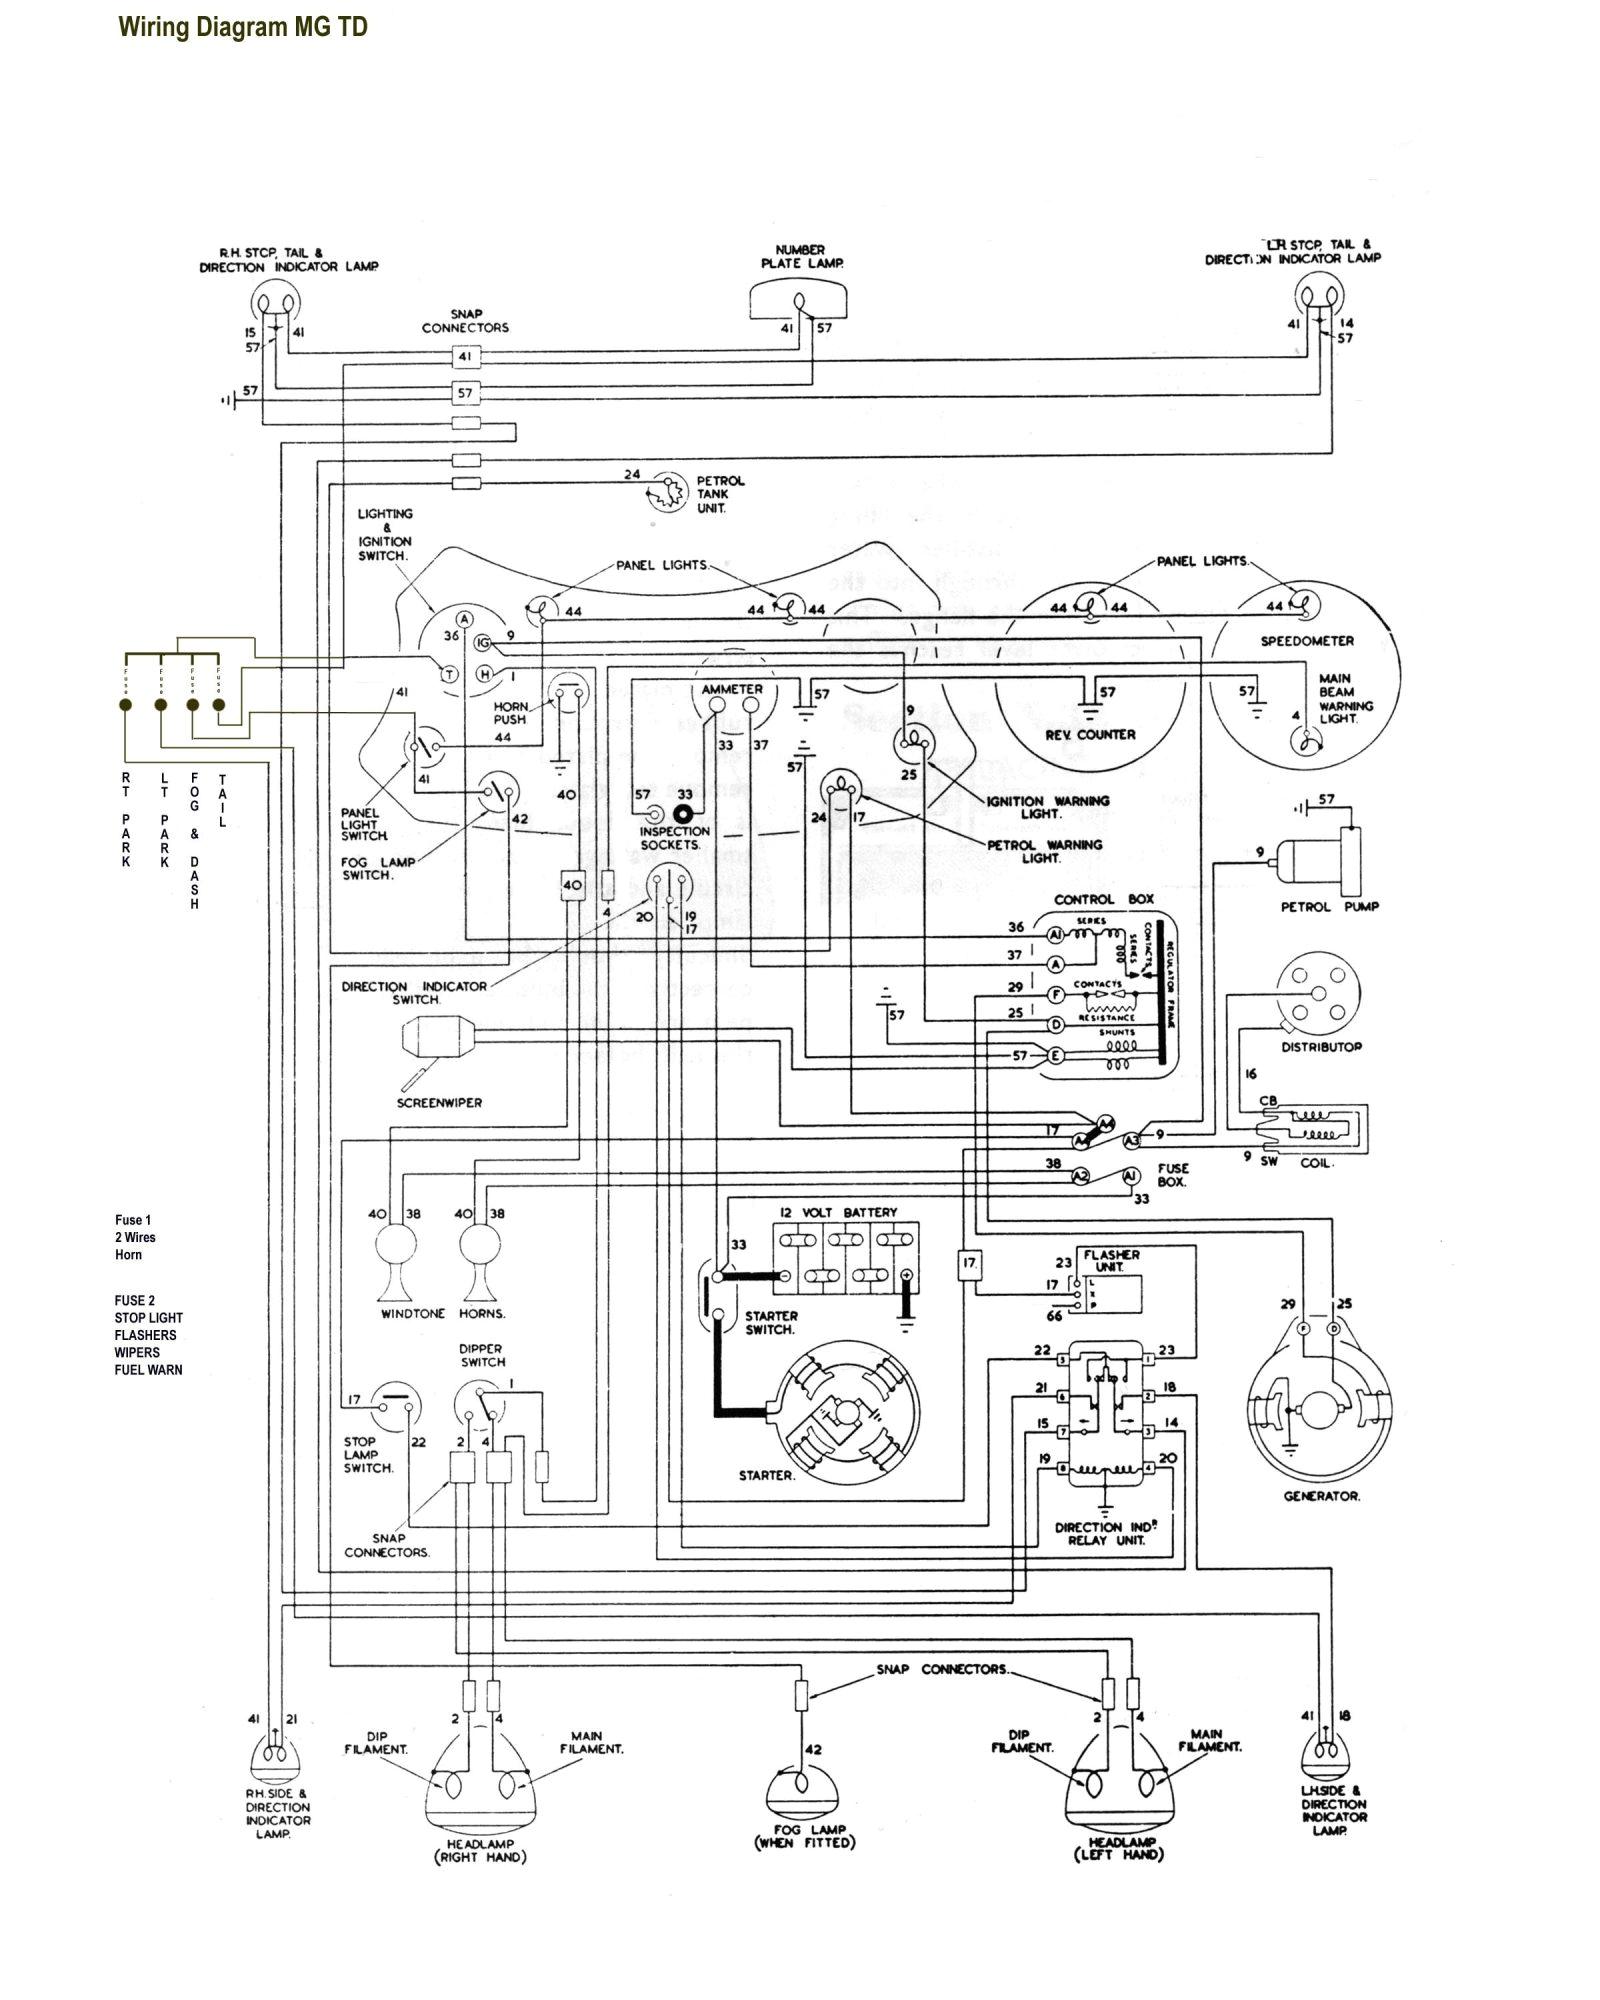 mg wiring harness diagram wiring diagram papermg tc wiring diagram wiring diagram for you mg wiring